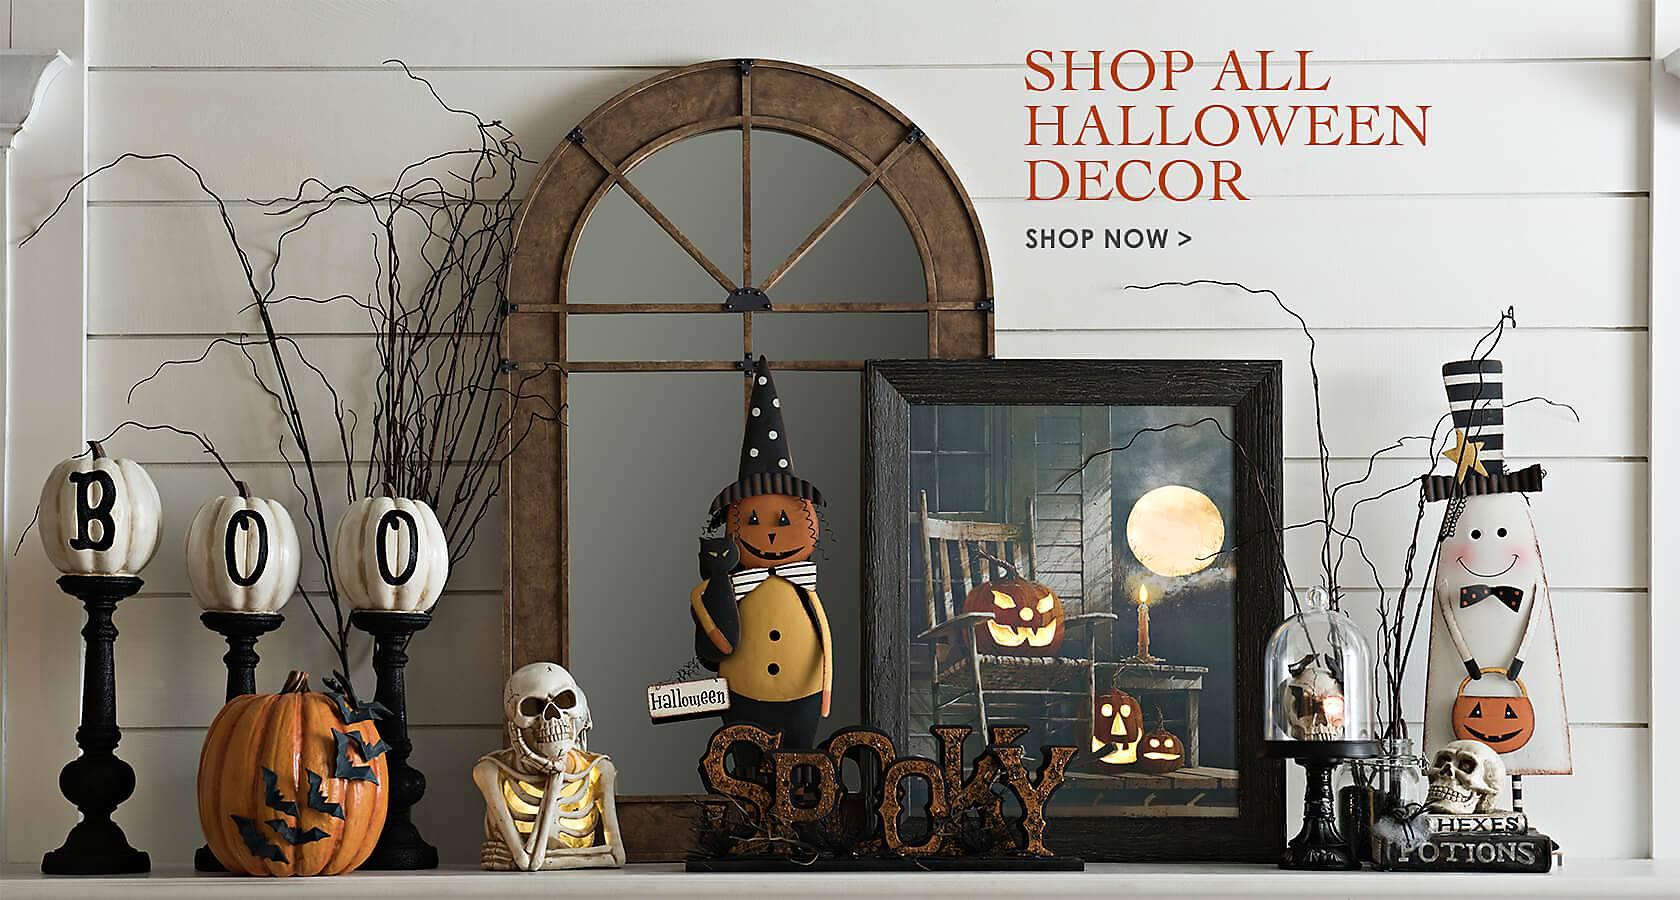 Shop all Halloween decor - Shop Now